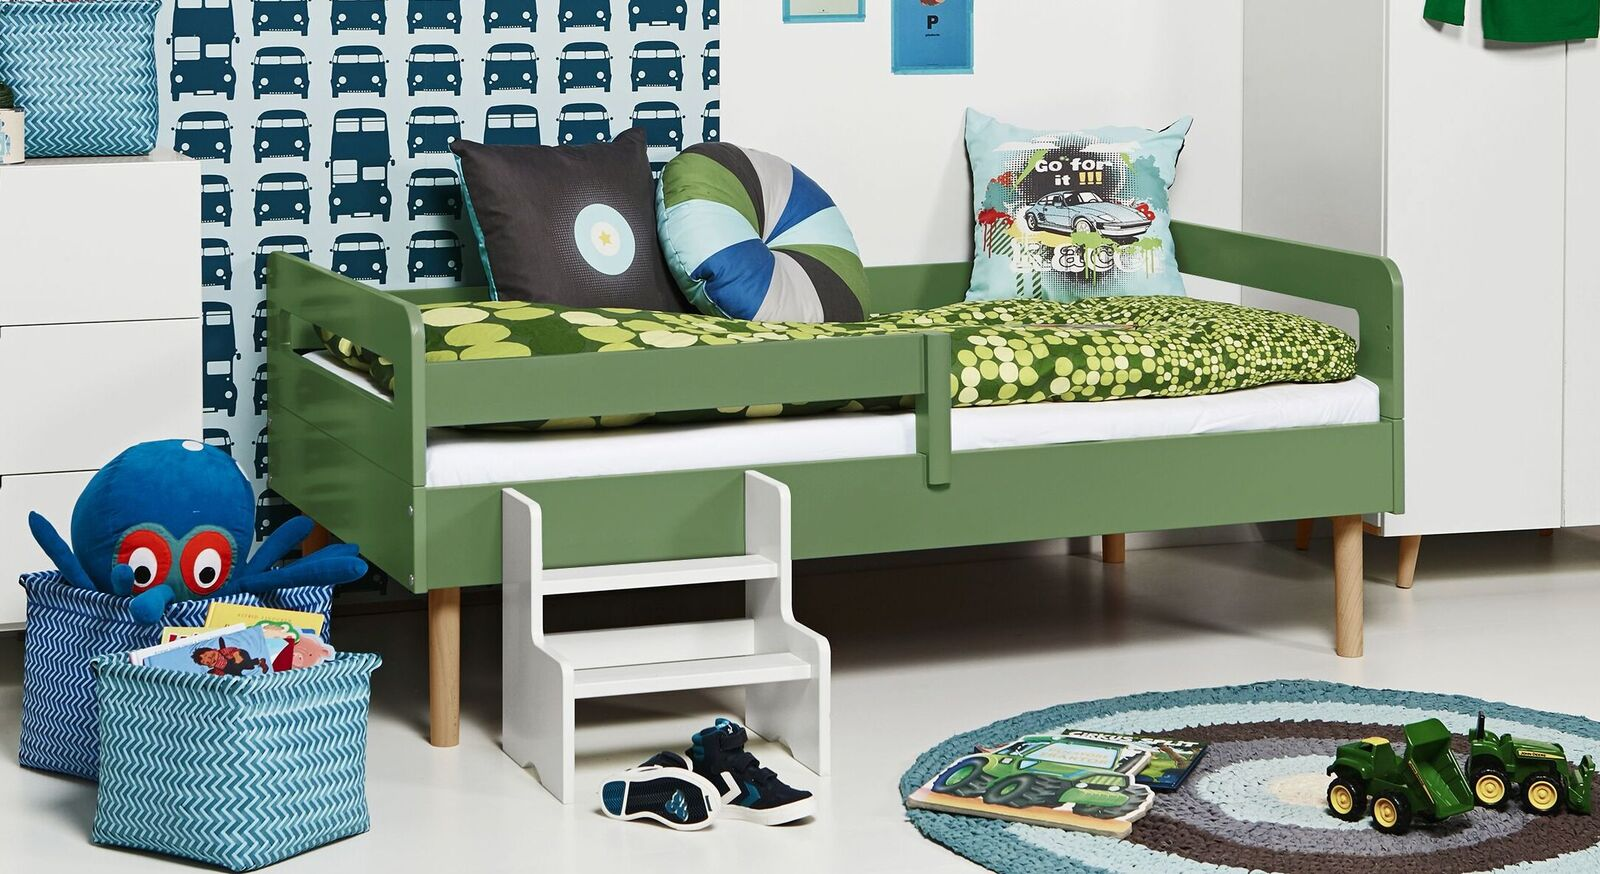 Modernes Kinderbett Kids Town Retro aus olivefarbenem MDF